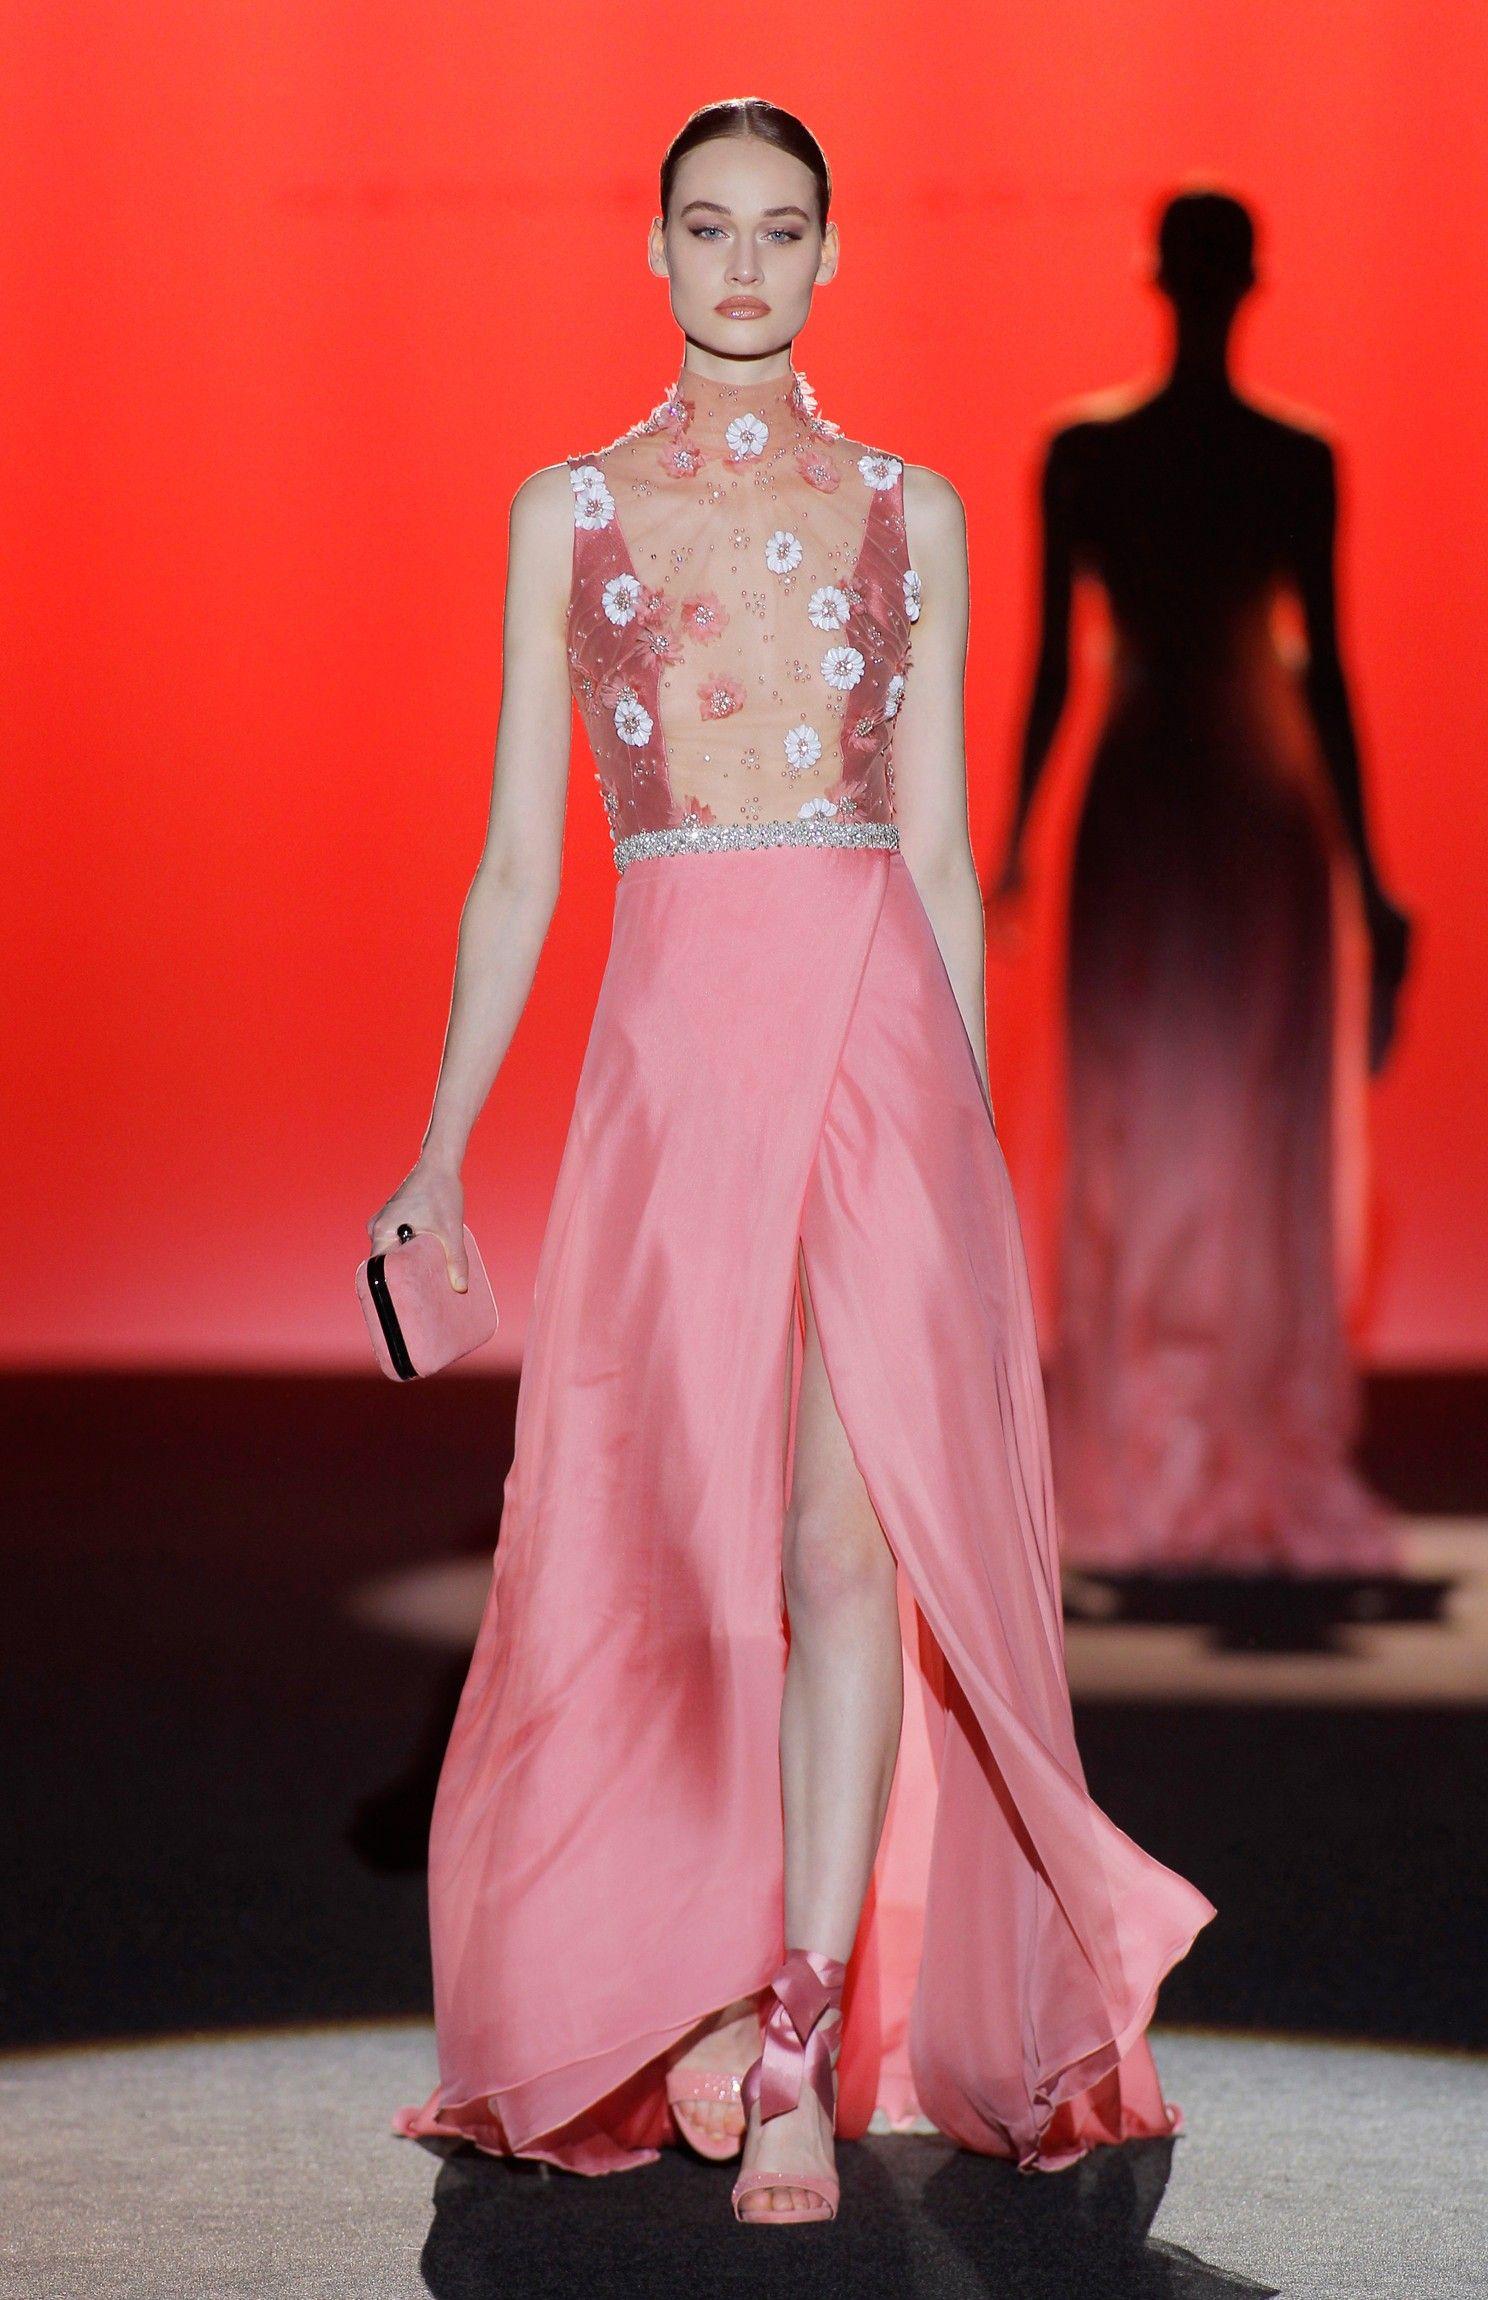 Otoño - Invierno 2017 - 2018 - Couture Hannibal Laguna | Glamour ...